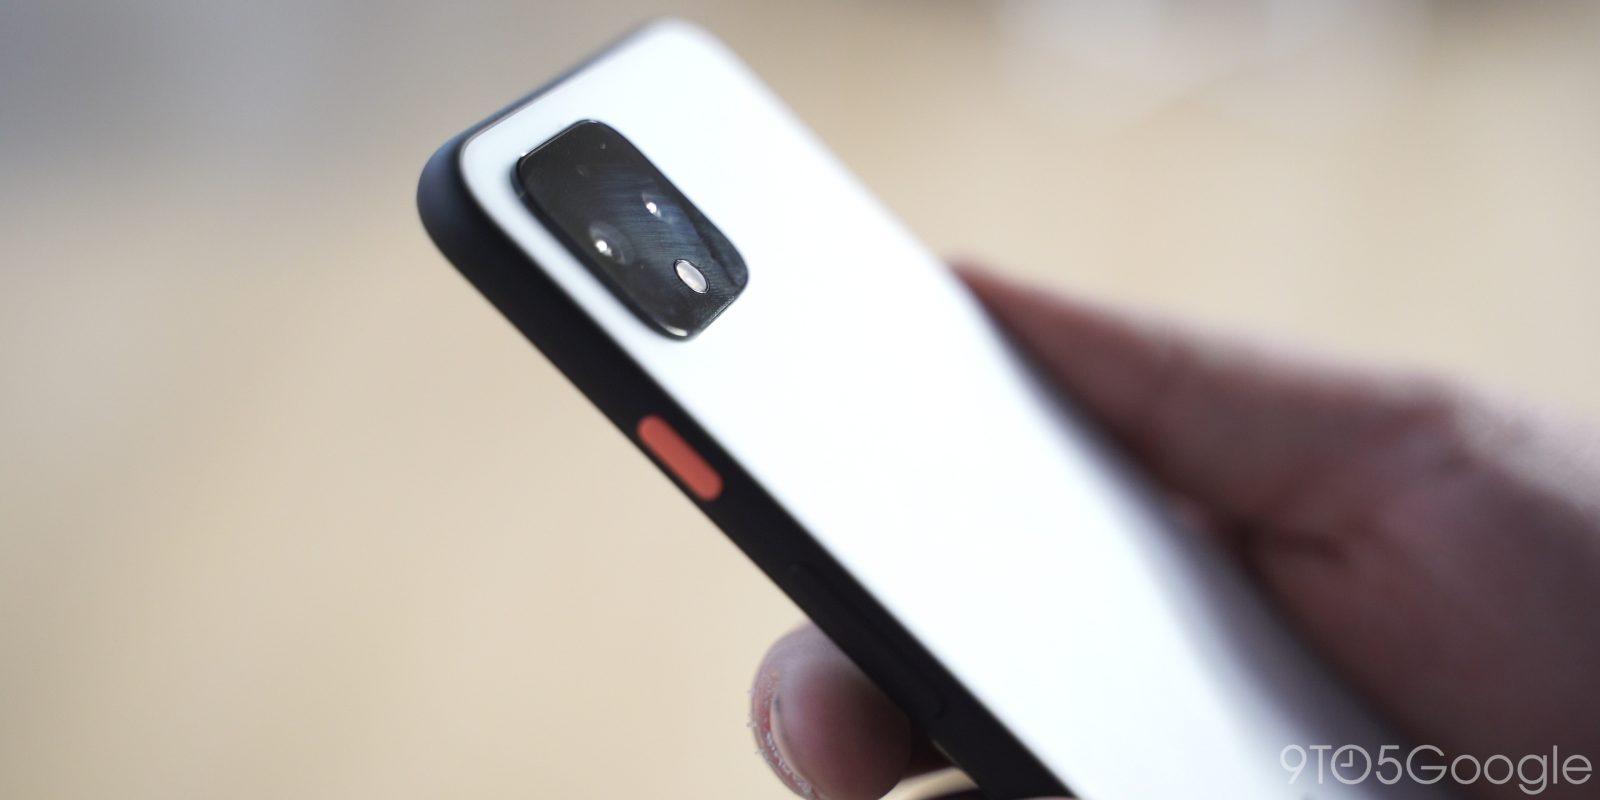 Pixel 4 tidbits: Face unlock security, iPhone 11 camera comparison, more